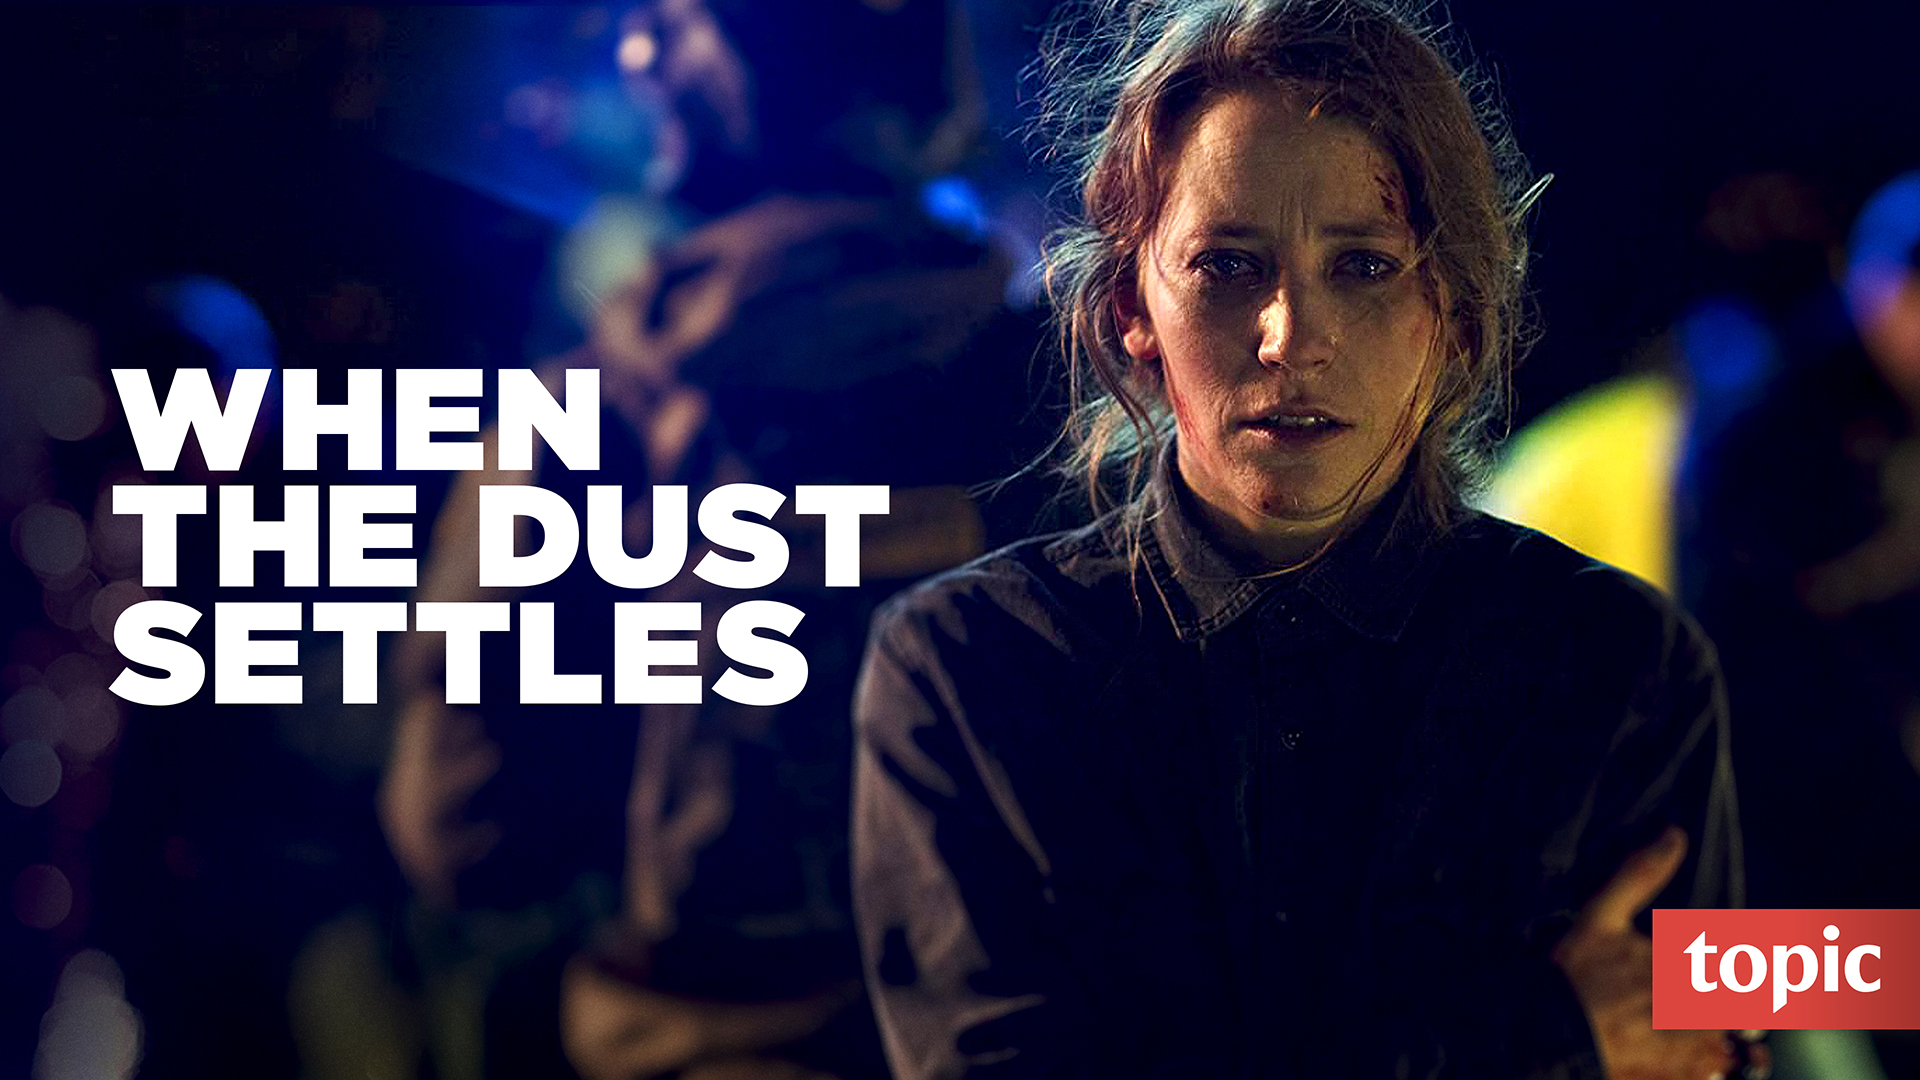 When the Dust Settles Season 1